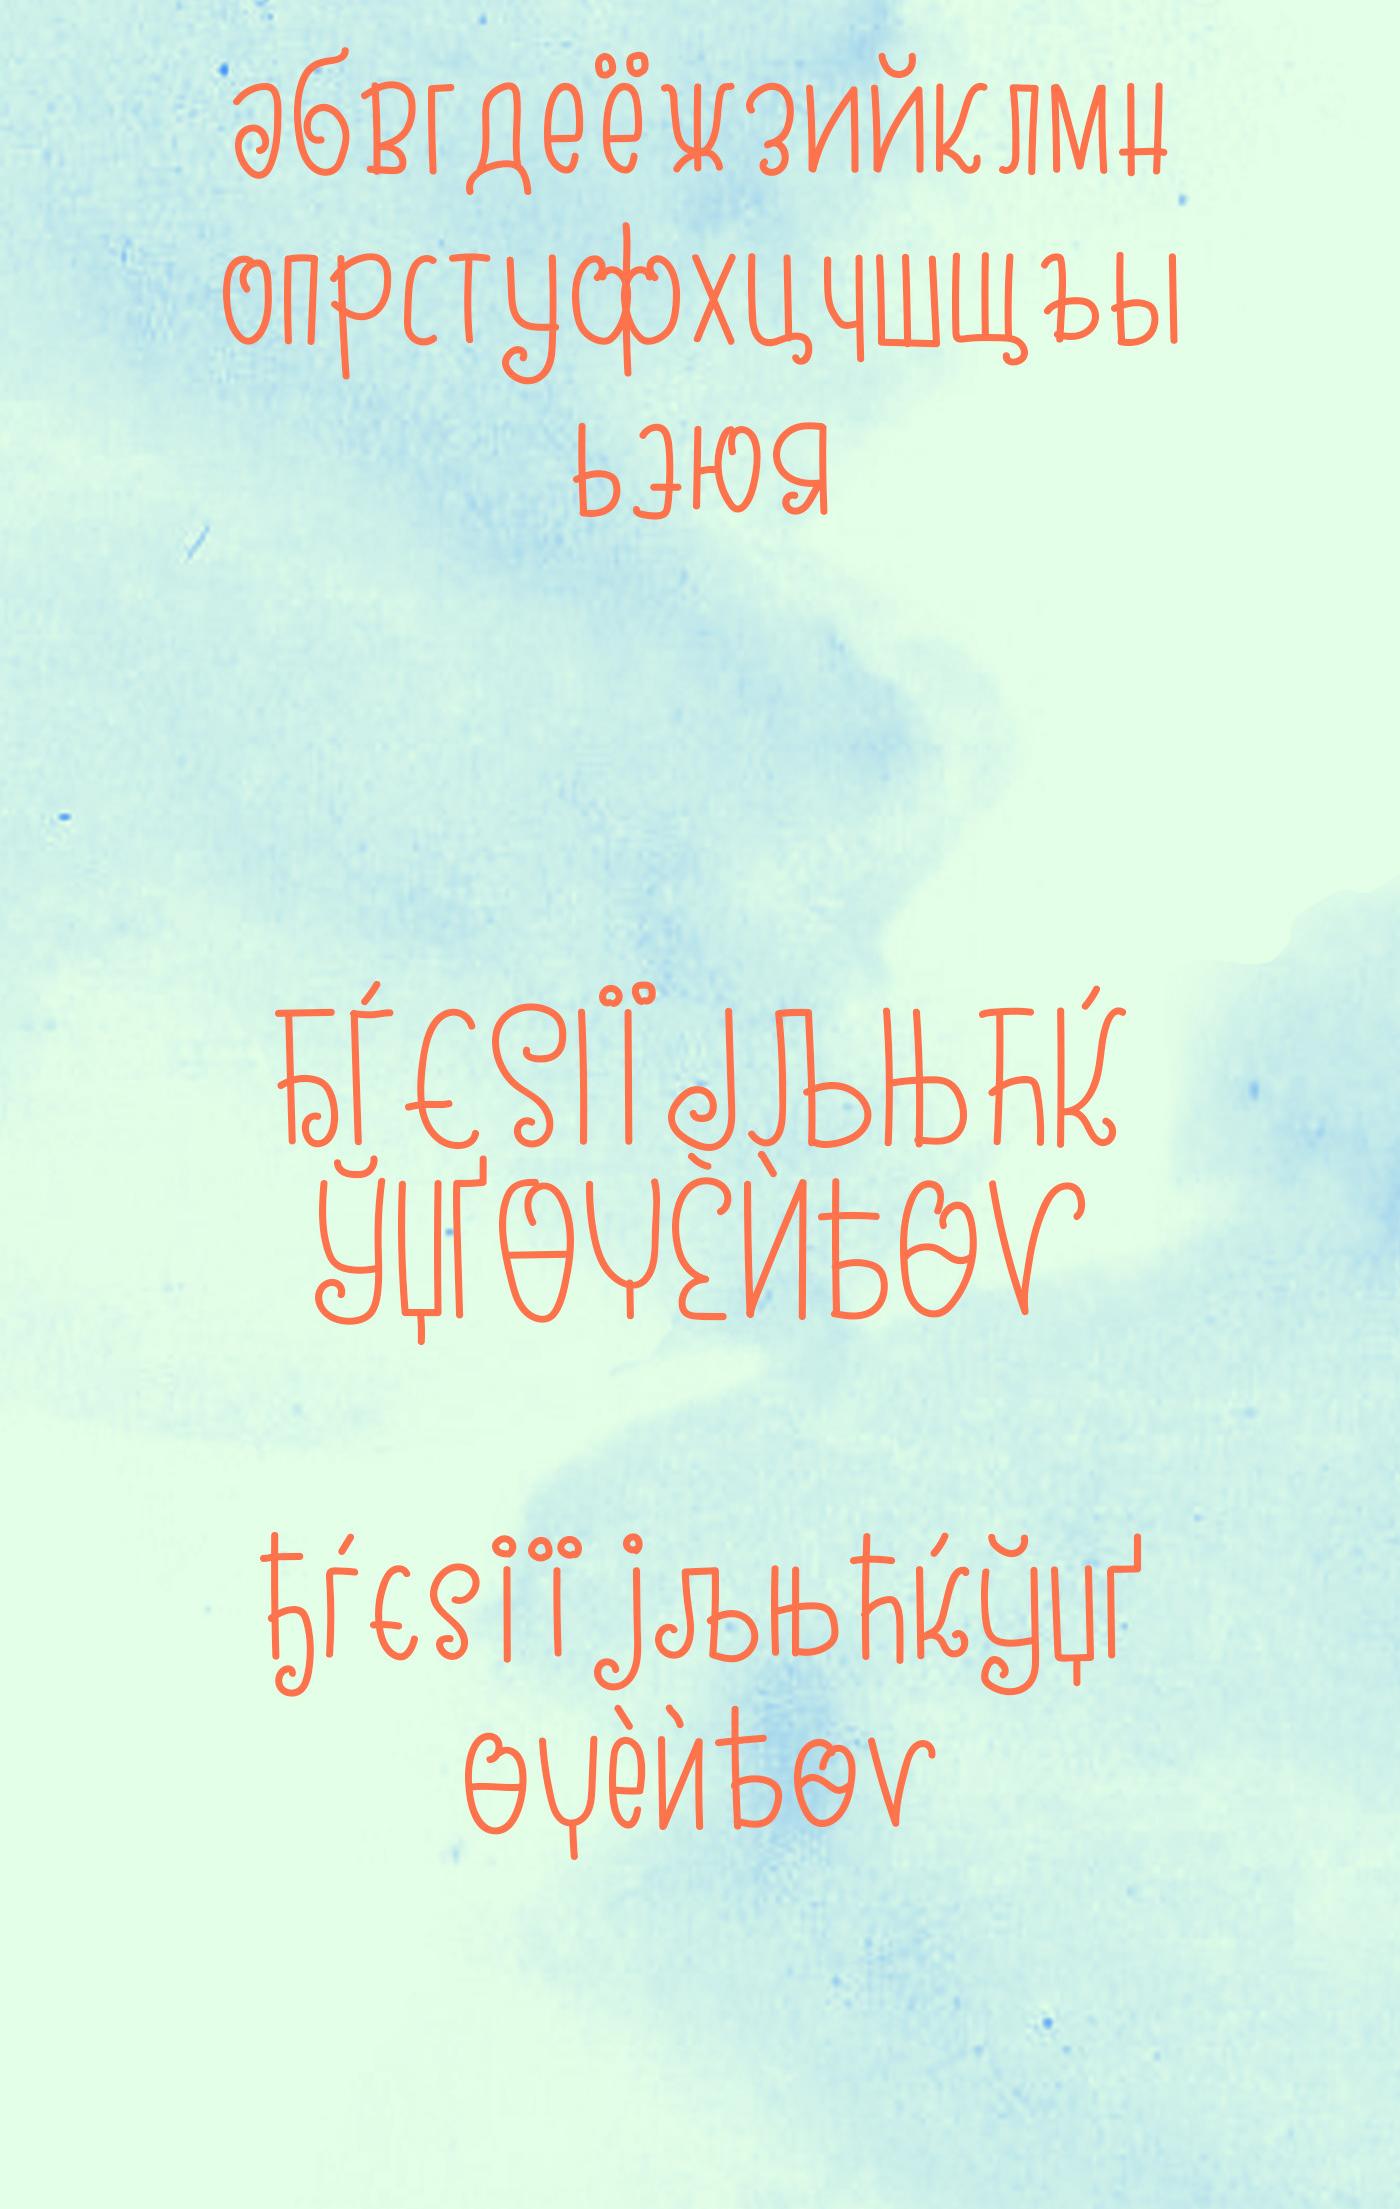 LITTLE DREAM Free Font - script